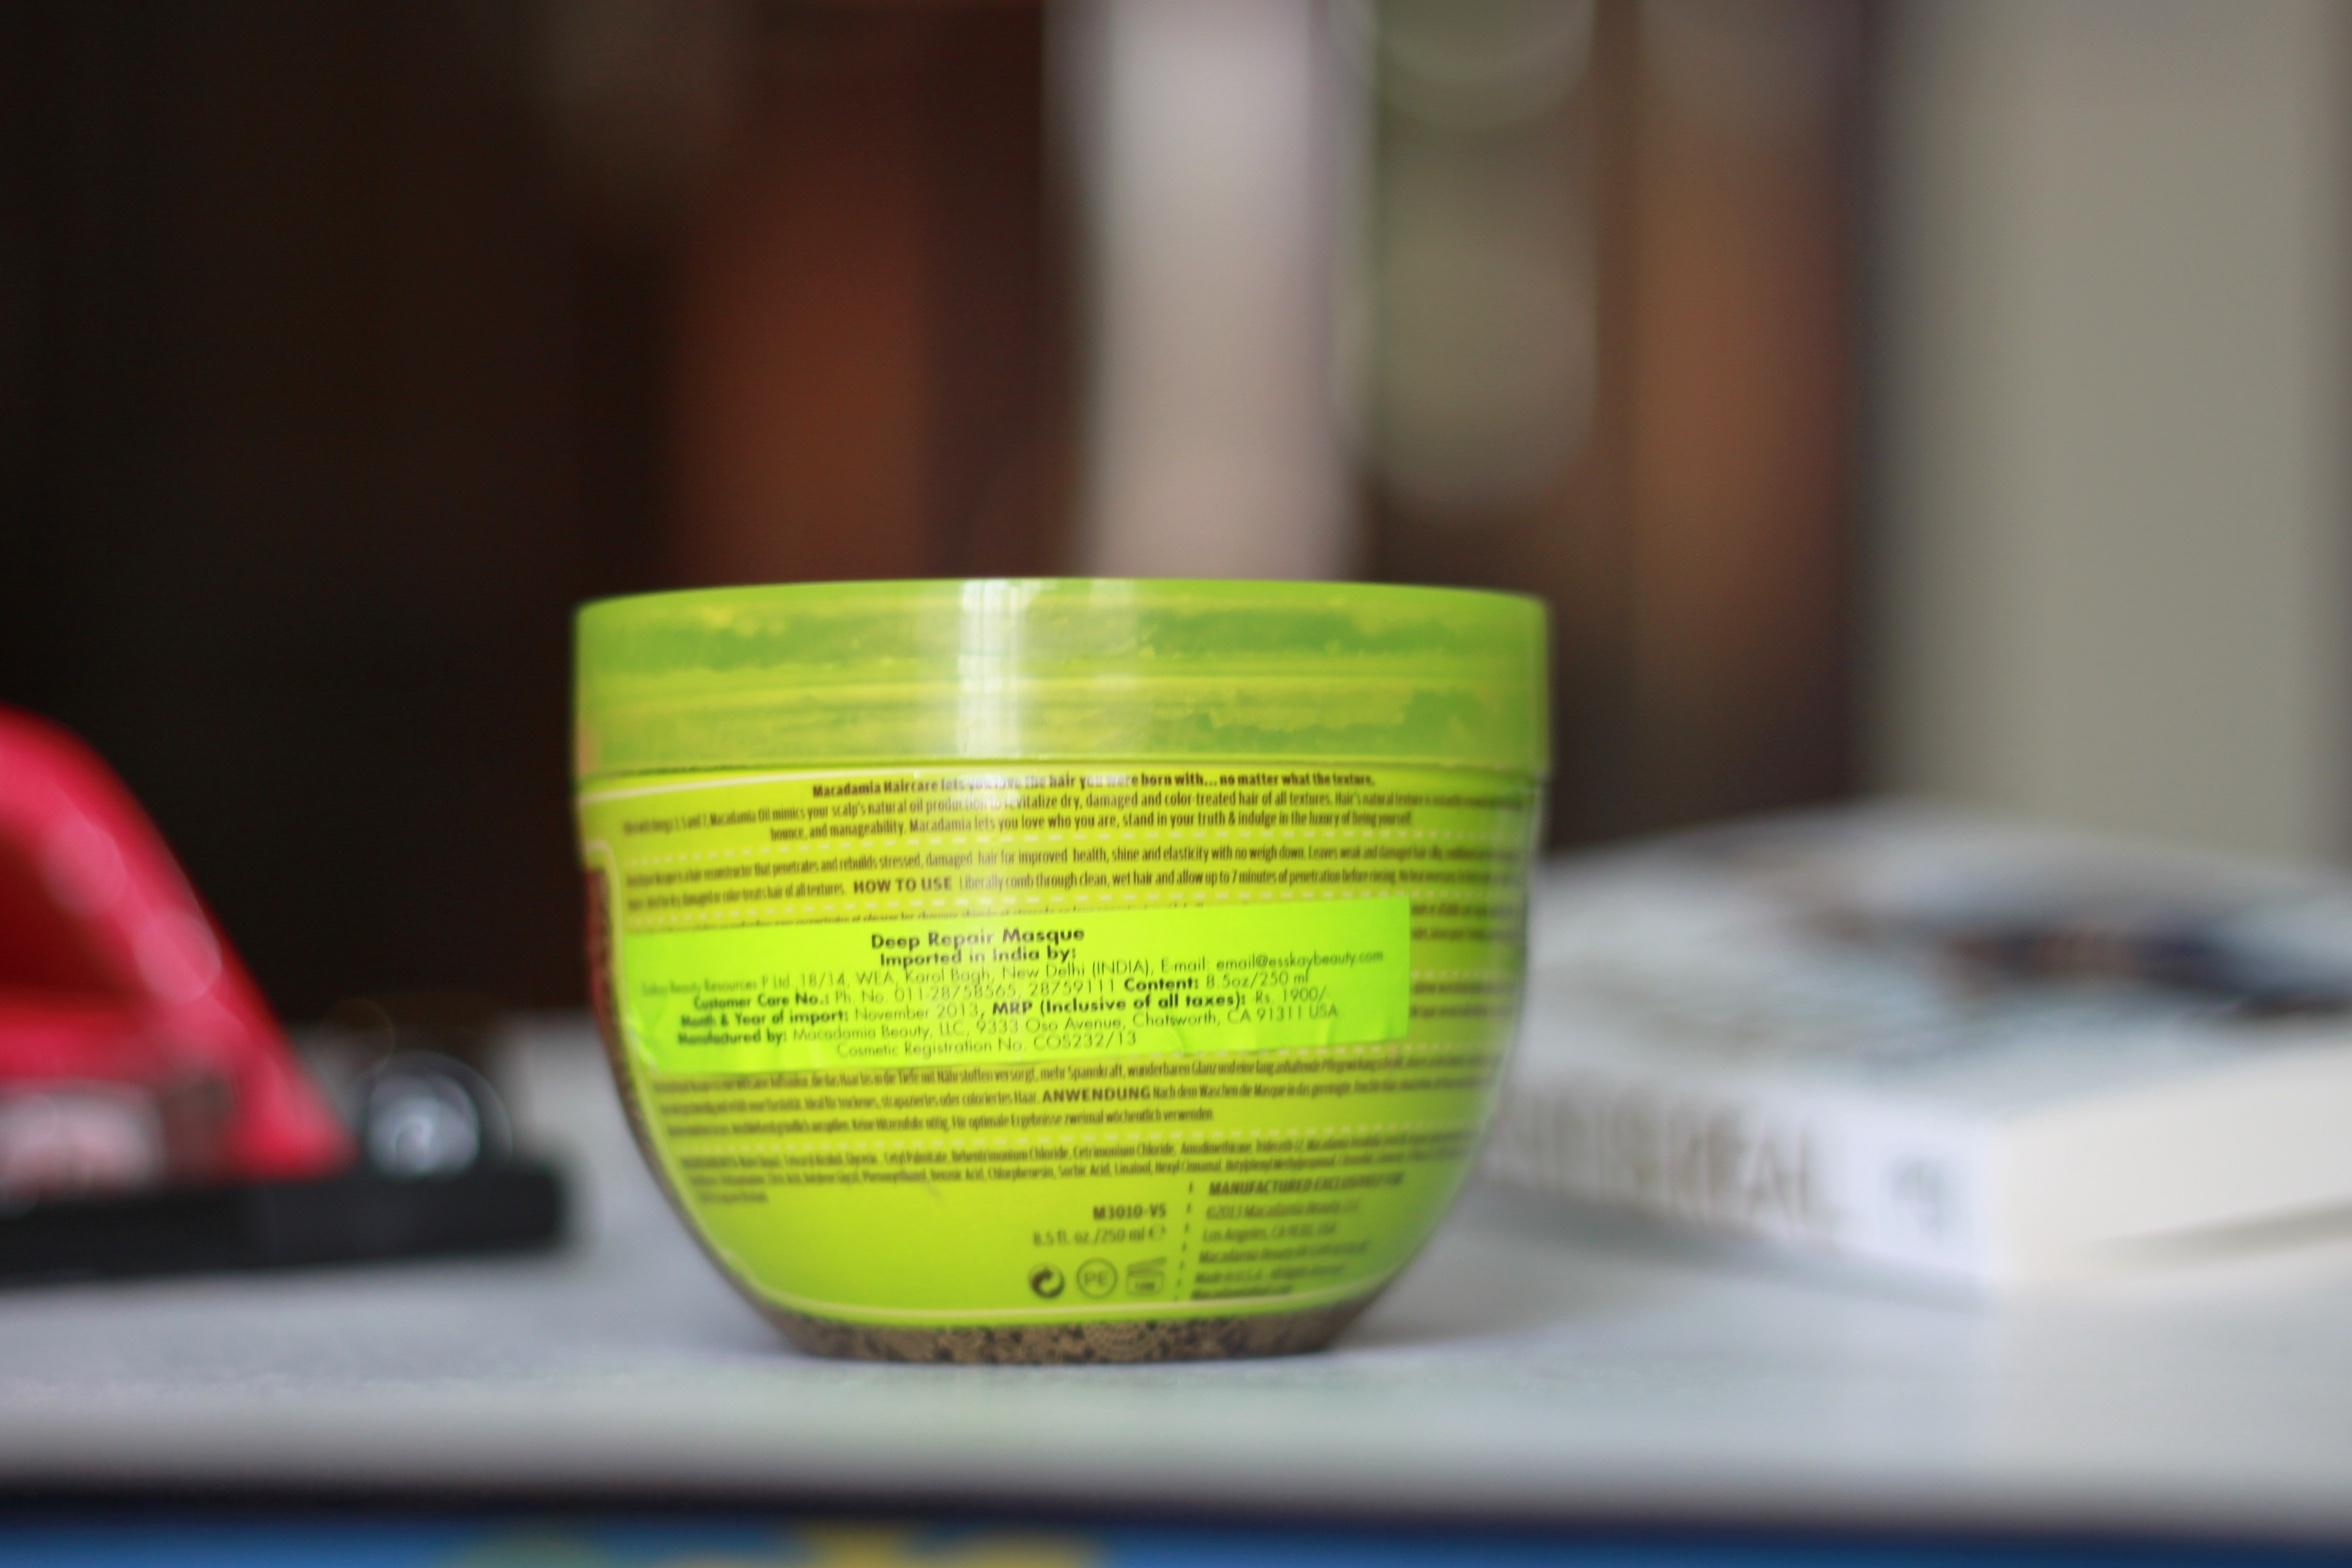 macadamia deep repair masque, macadamia hair mask, macadamia hair conditioner, deep repair hair mask